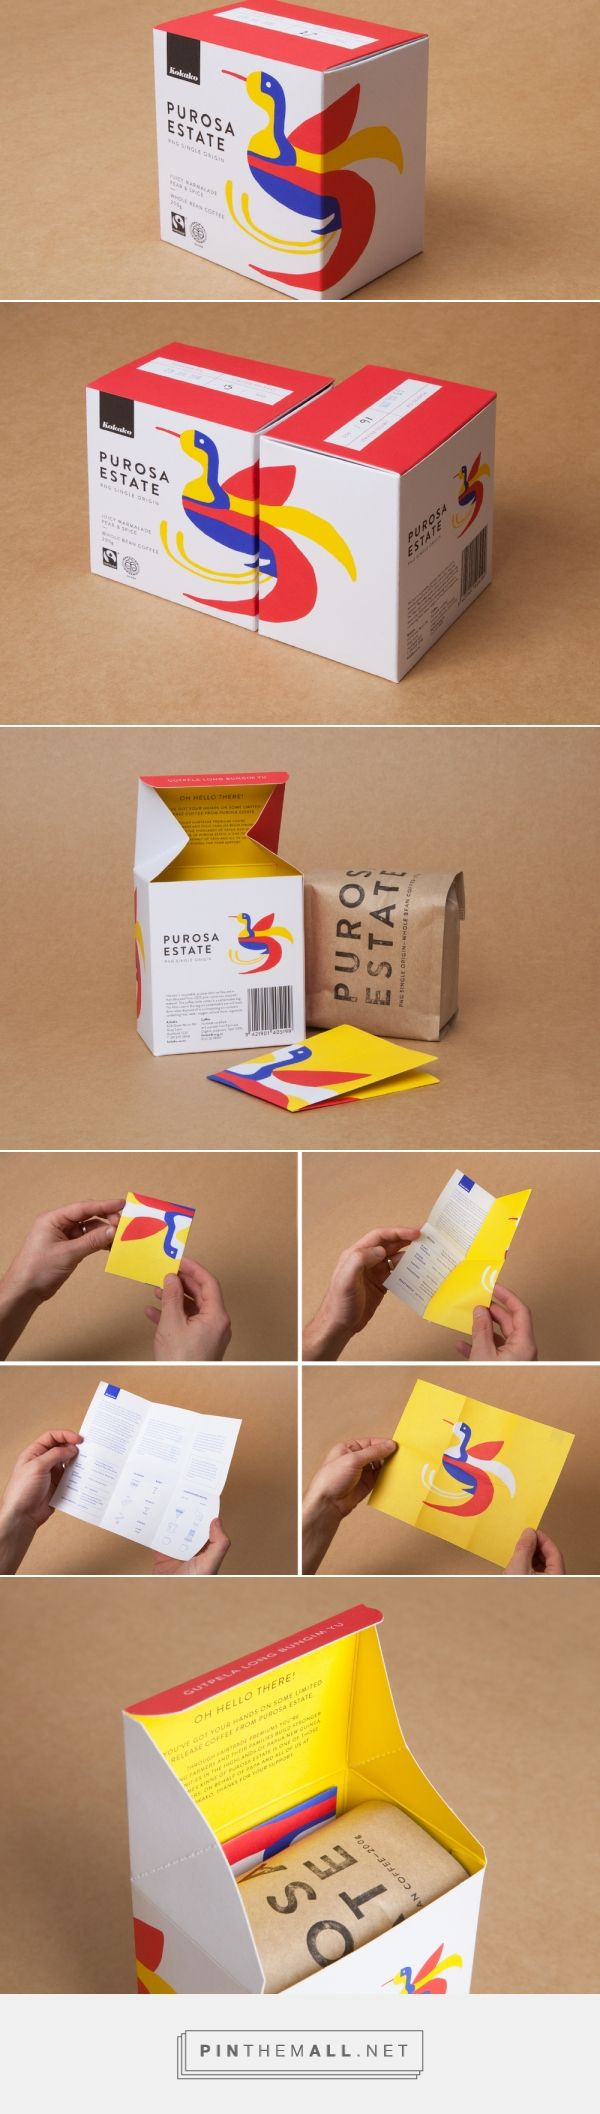 Kokako – Purosa Estate Single Origin — The Dieline - Branding & Packaging Design - created via https://pinthemall.net